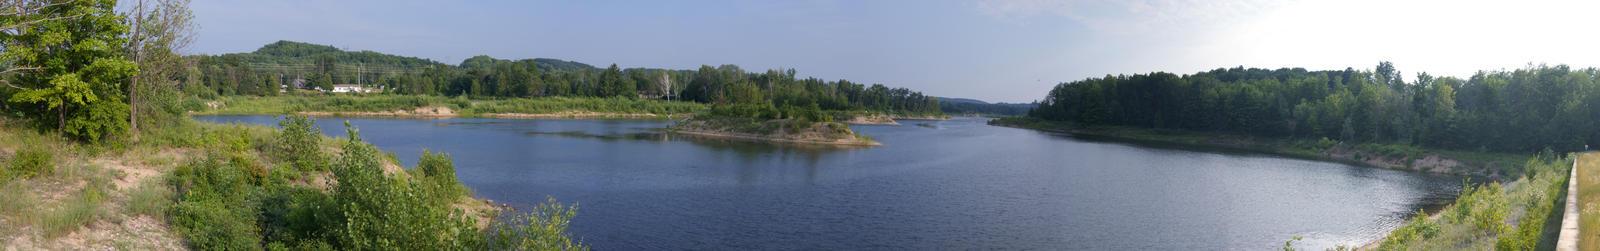 Boardman Pond Panorama by DaLeahWeathers